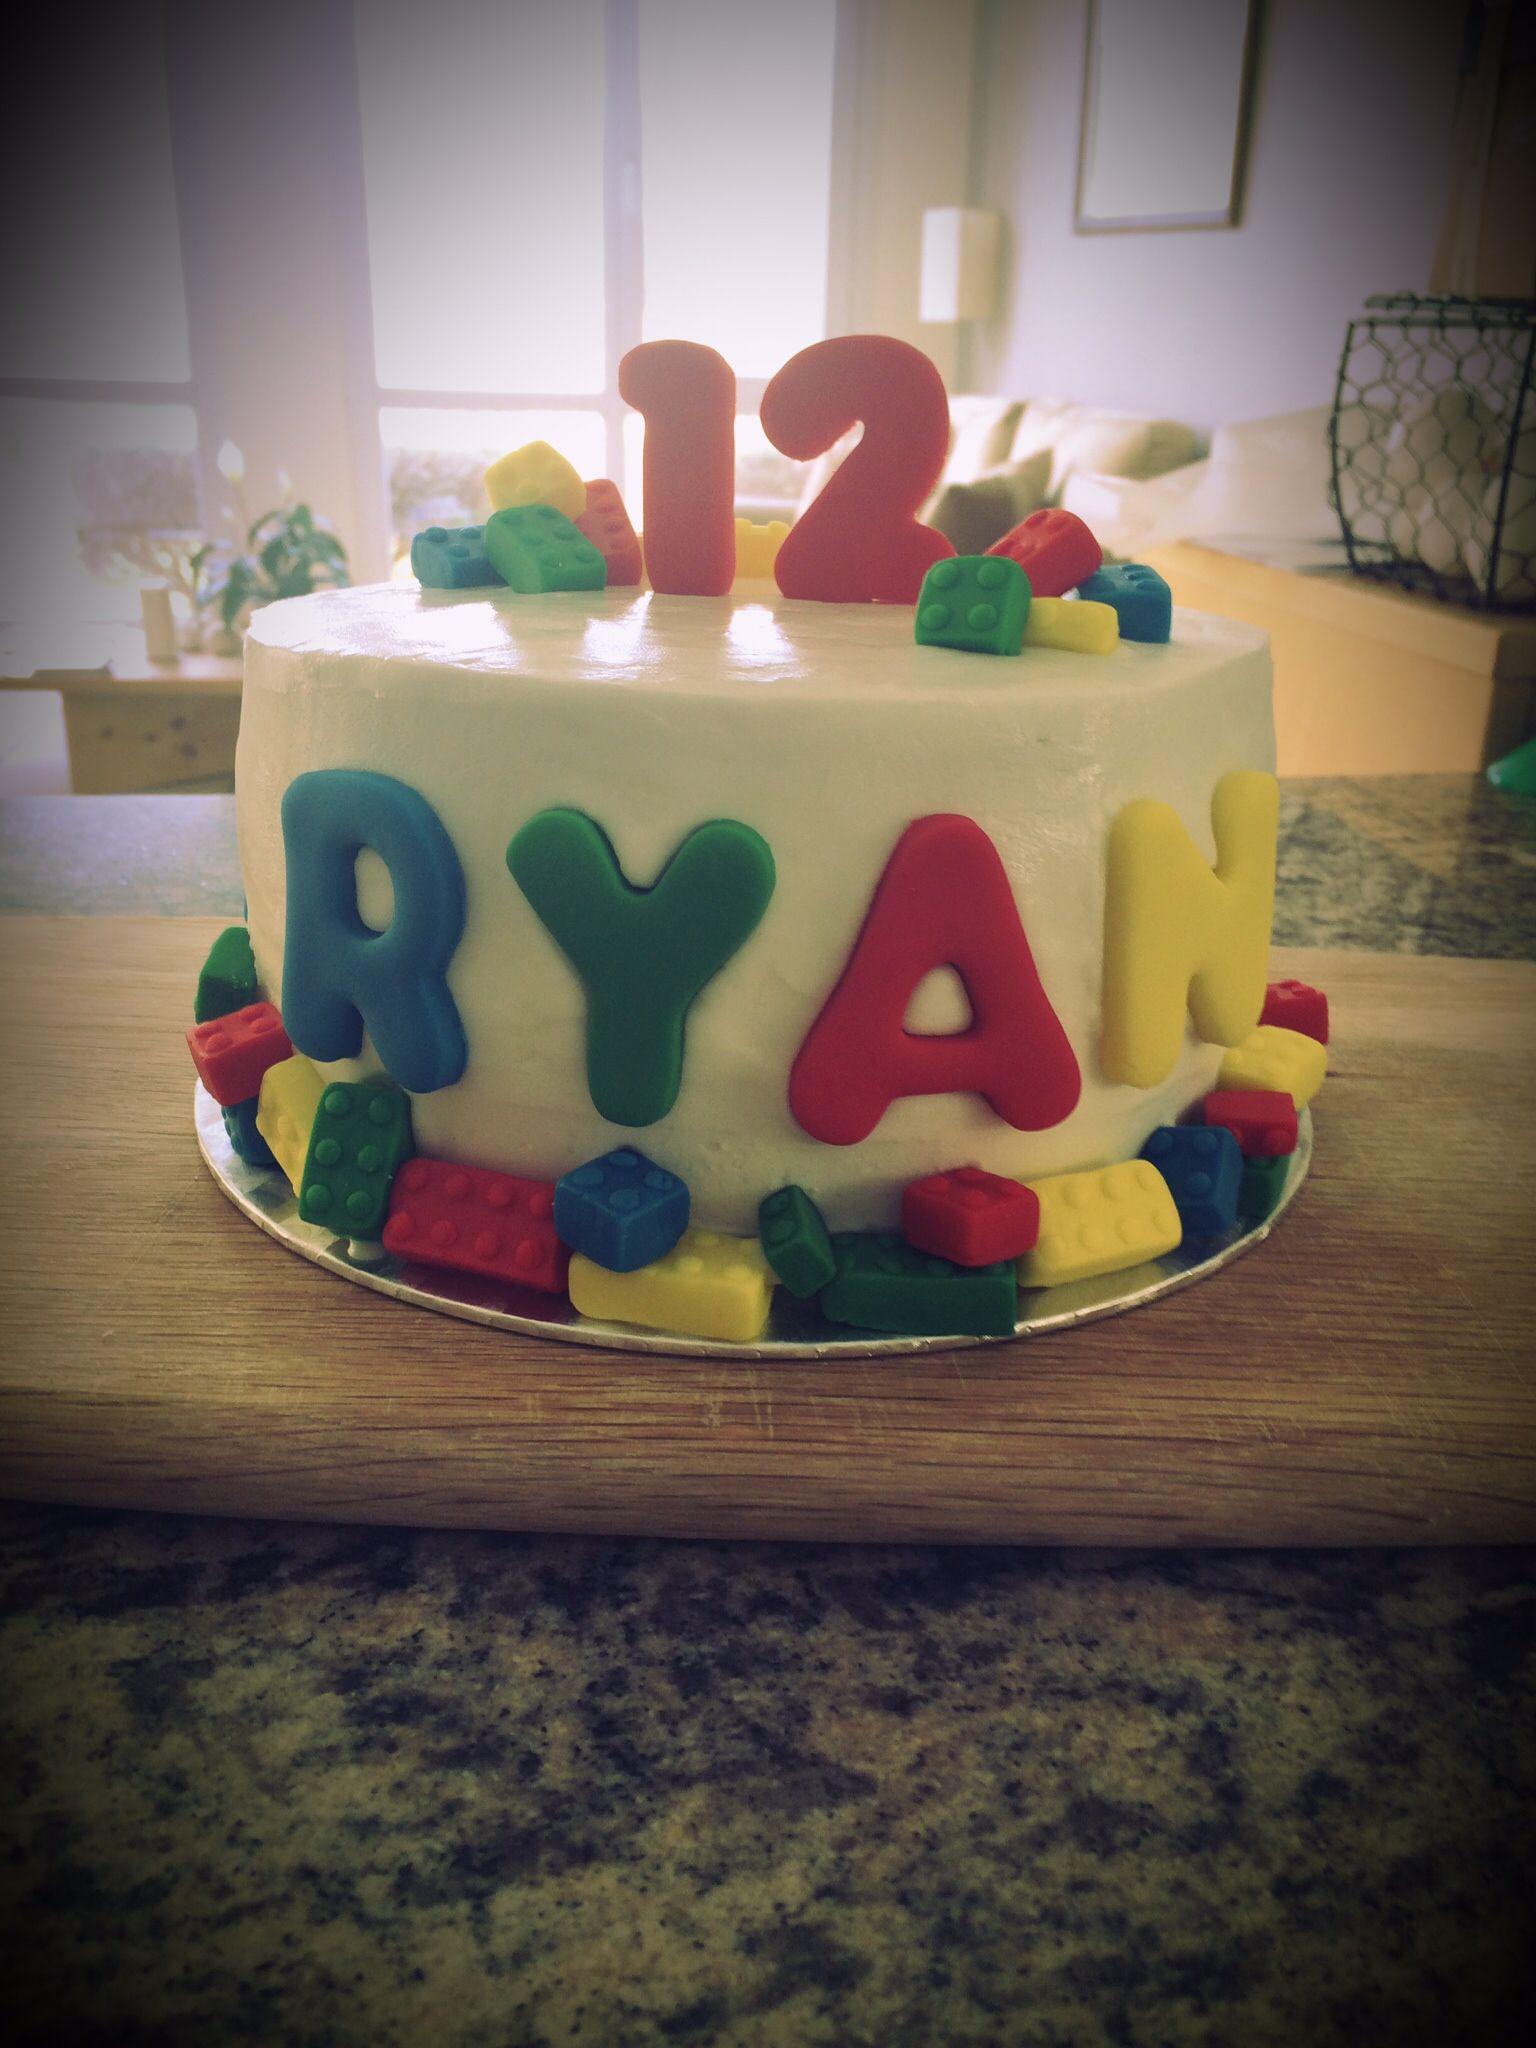 Lego Cake For A 12 Year Old Boy Vanilla Madeira With Chocolate Buttercream Boy Birthday Cake Birthday Cake 12 Year Old Boy